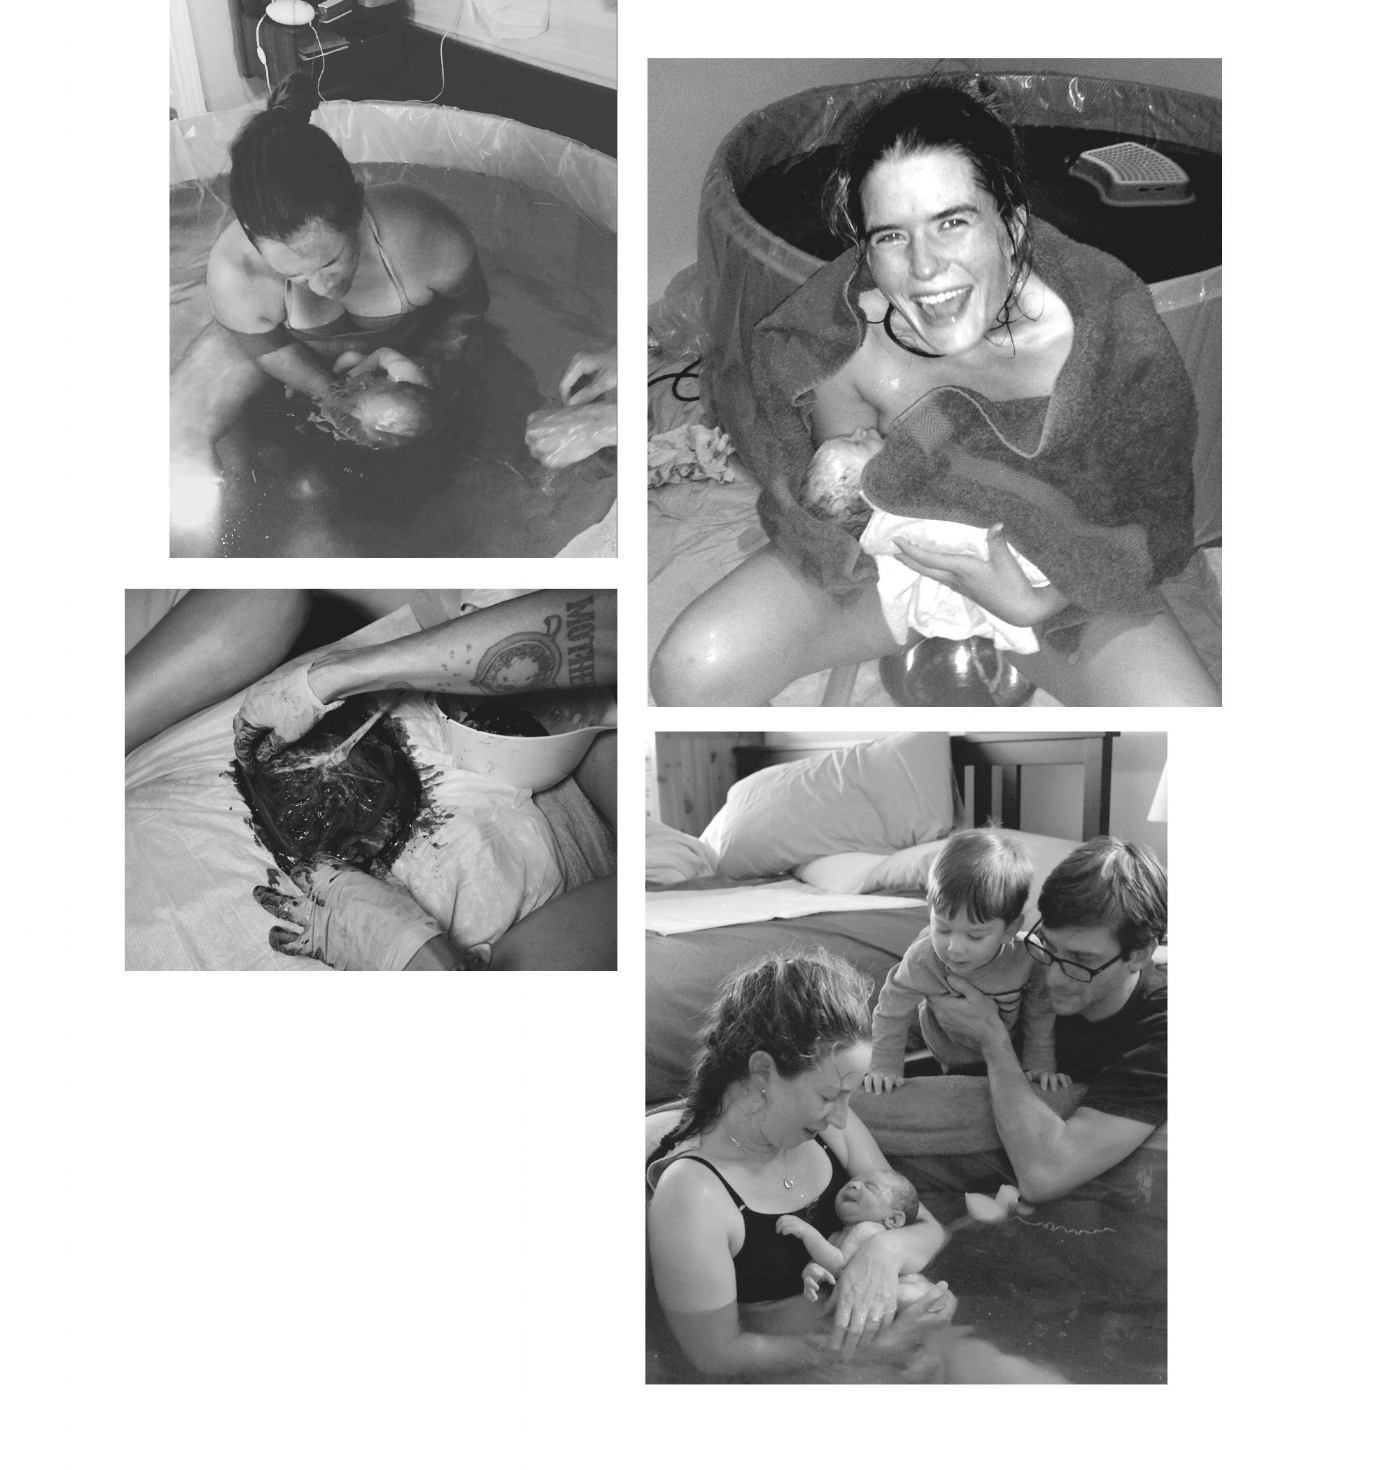 women-born-kelly-murphy-midwife-sanfrancisco-homebirth-1.jpg